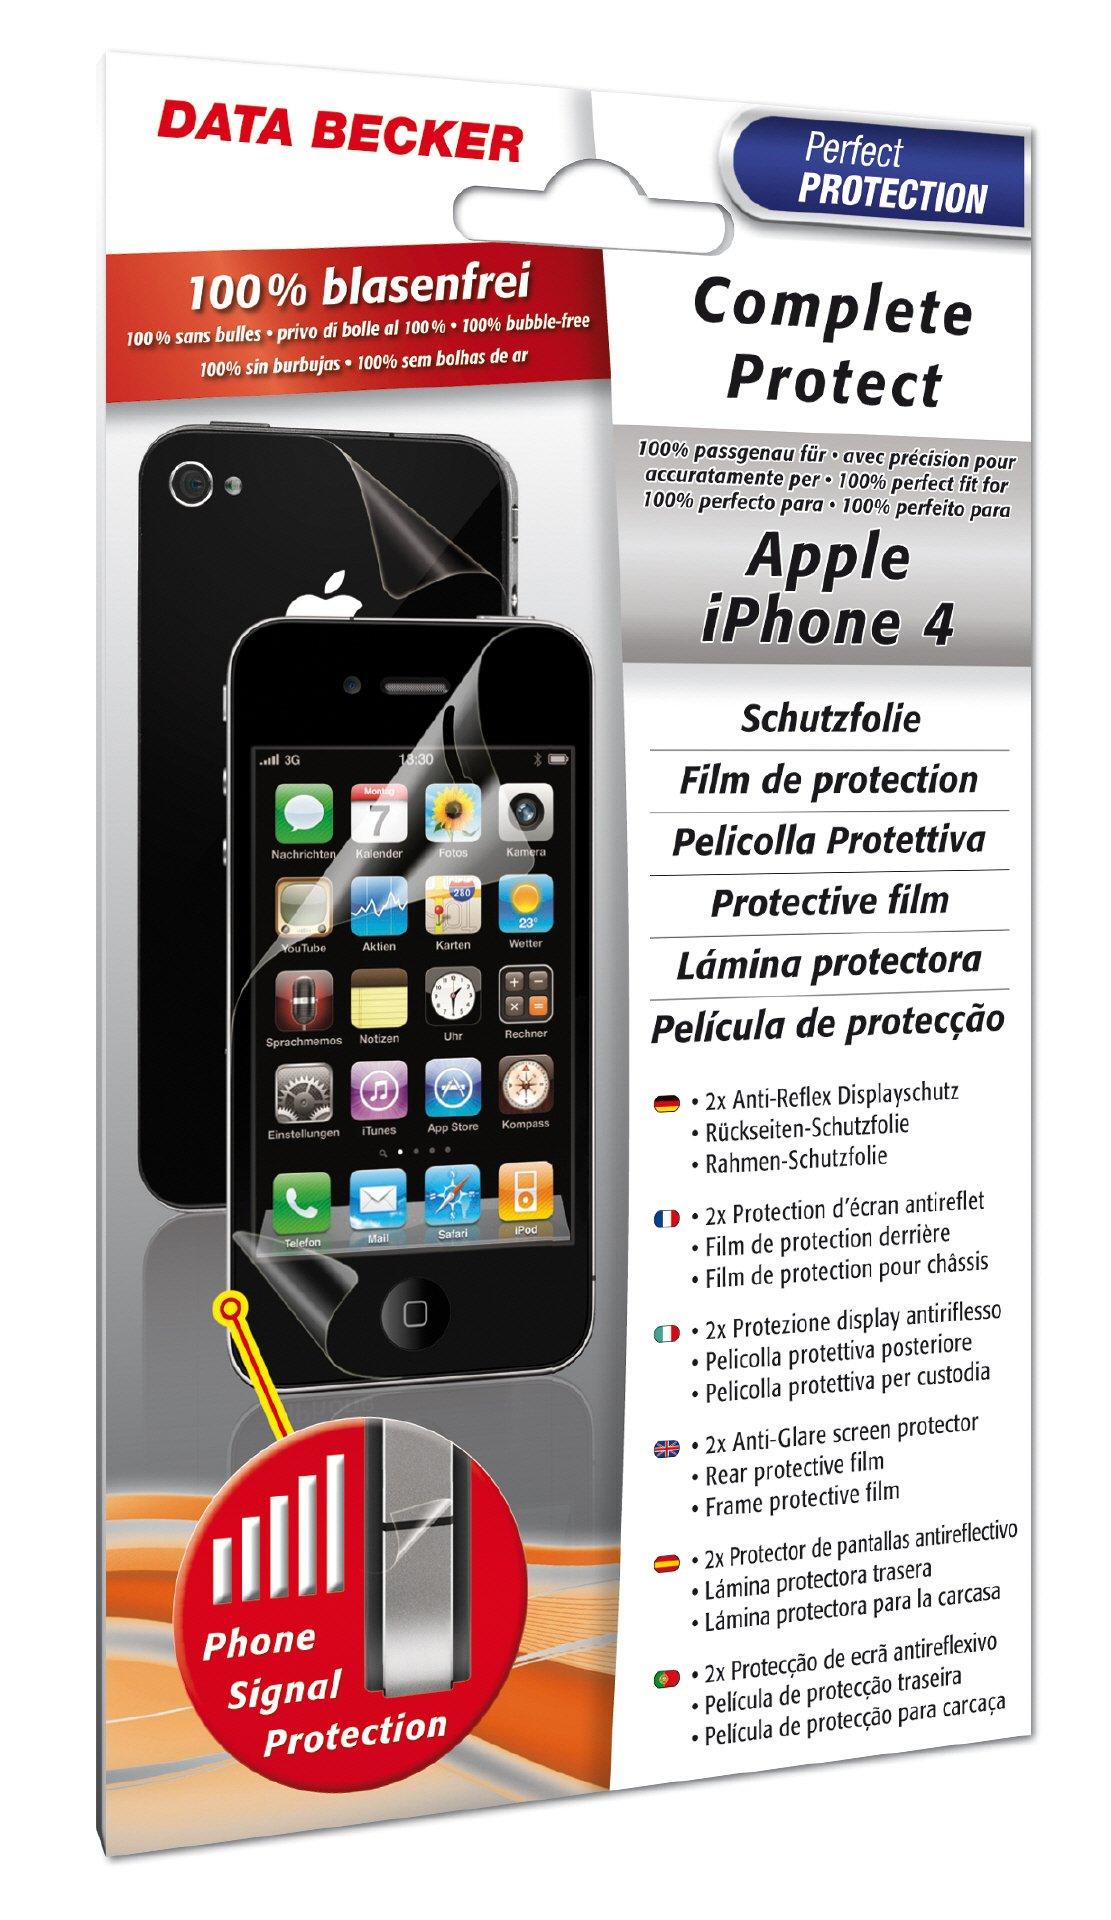 iPhone 4 Complete Protect Schutzfolie